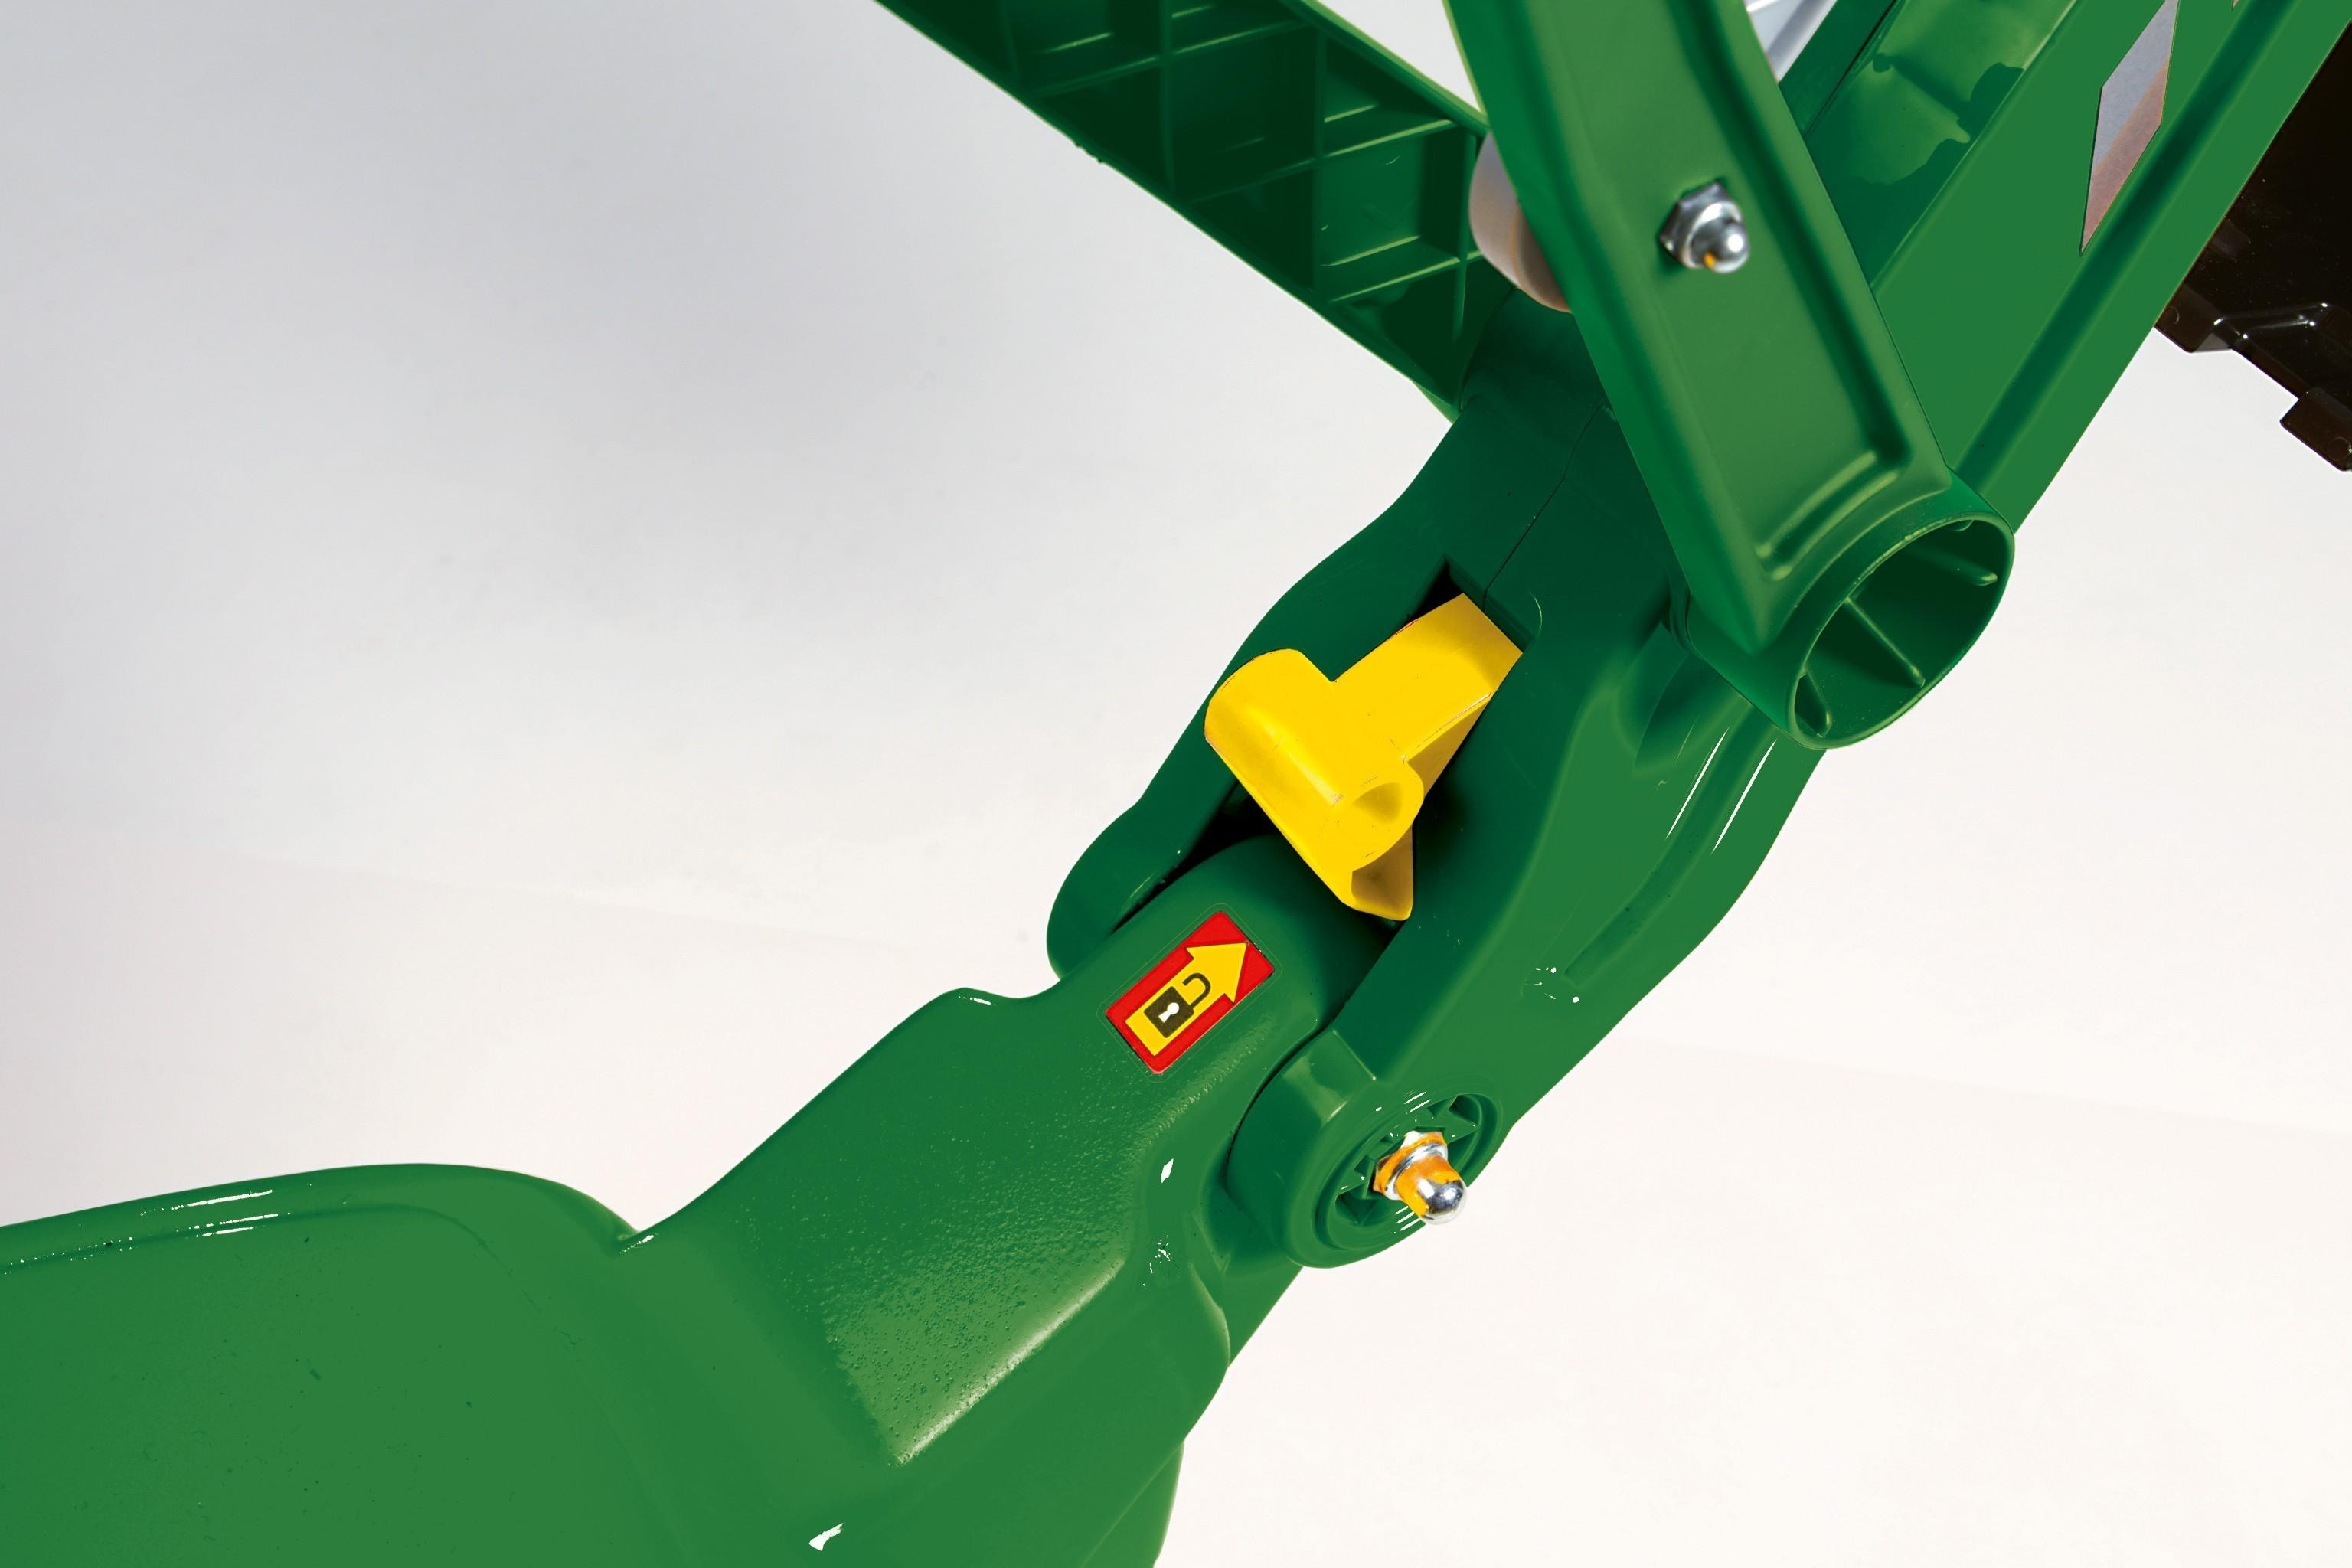 Rutschfahrzeug / Spielzeug-Bagger rolly Digger John Deere - Rolly Toys Bild 3